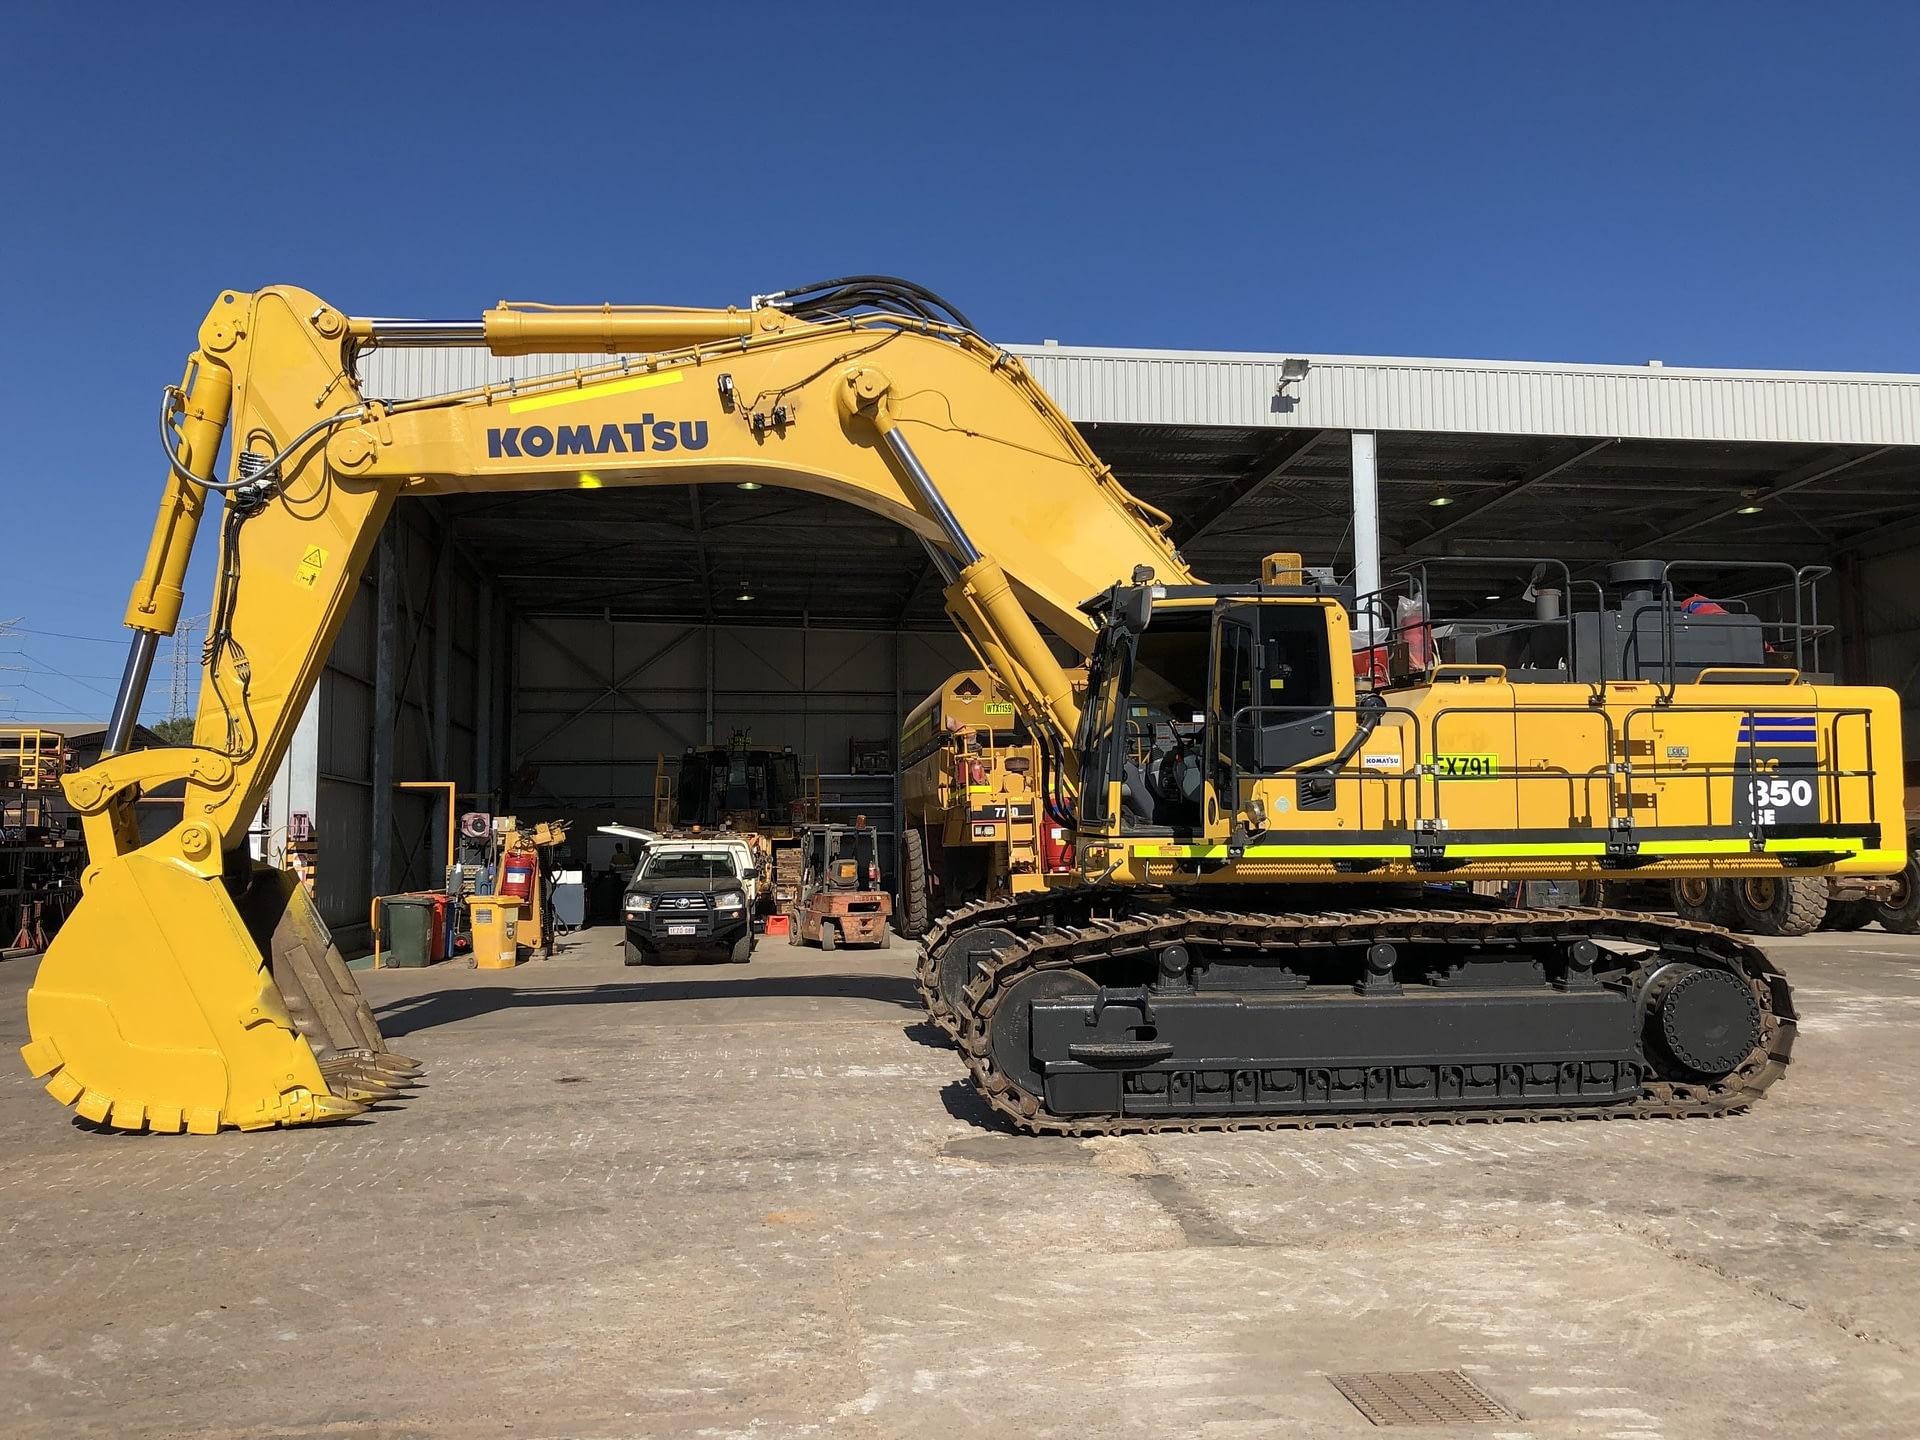 Komatsu PC850 Excavator - For Hire